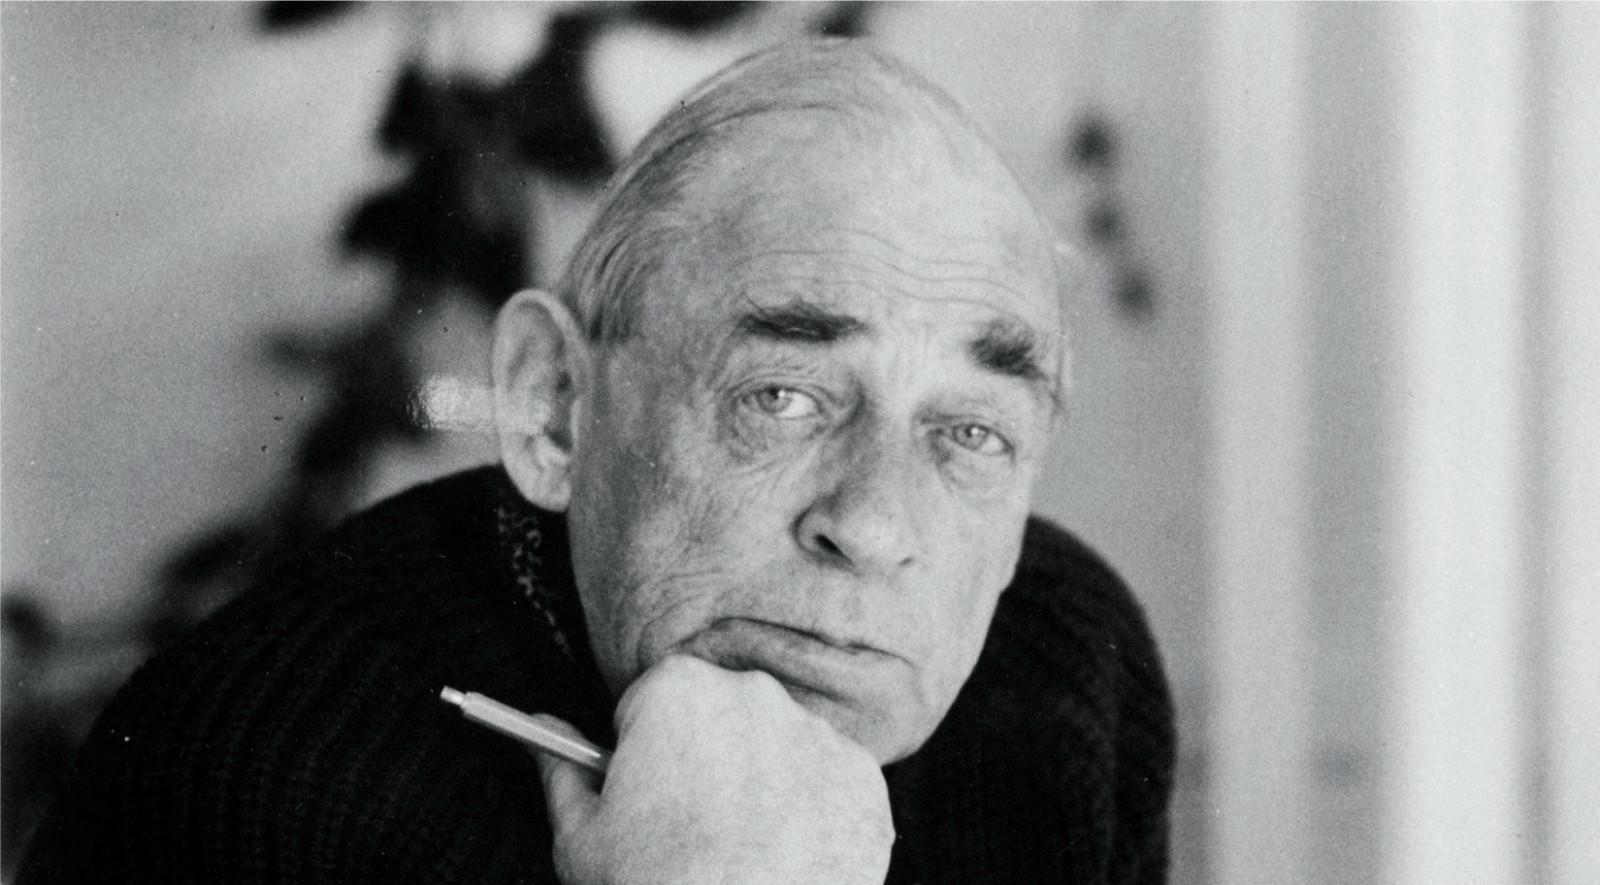 Alvar Aalto - source: aasarchitecture.com